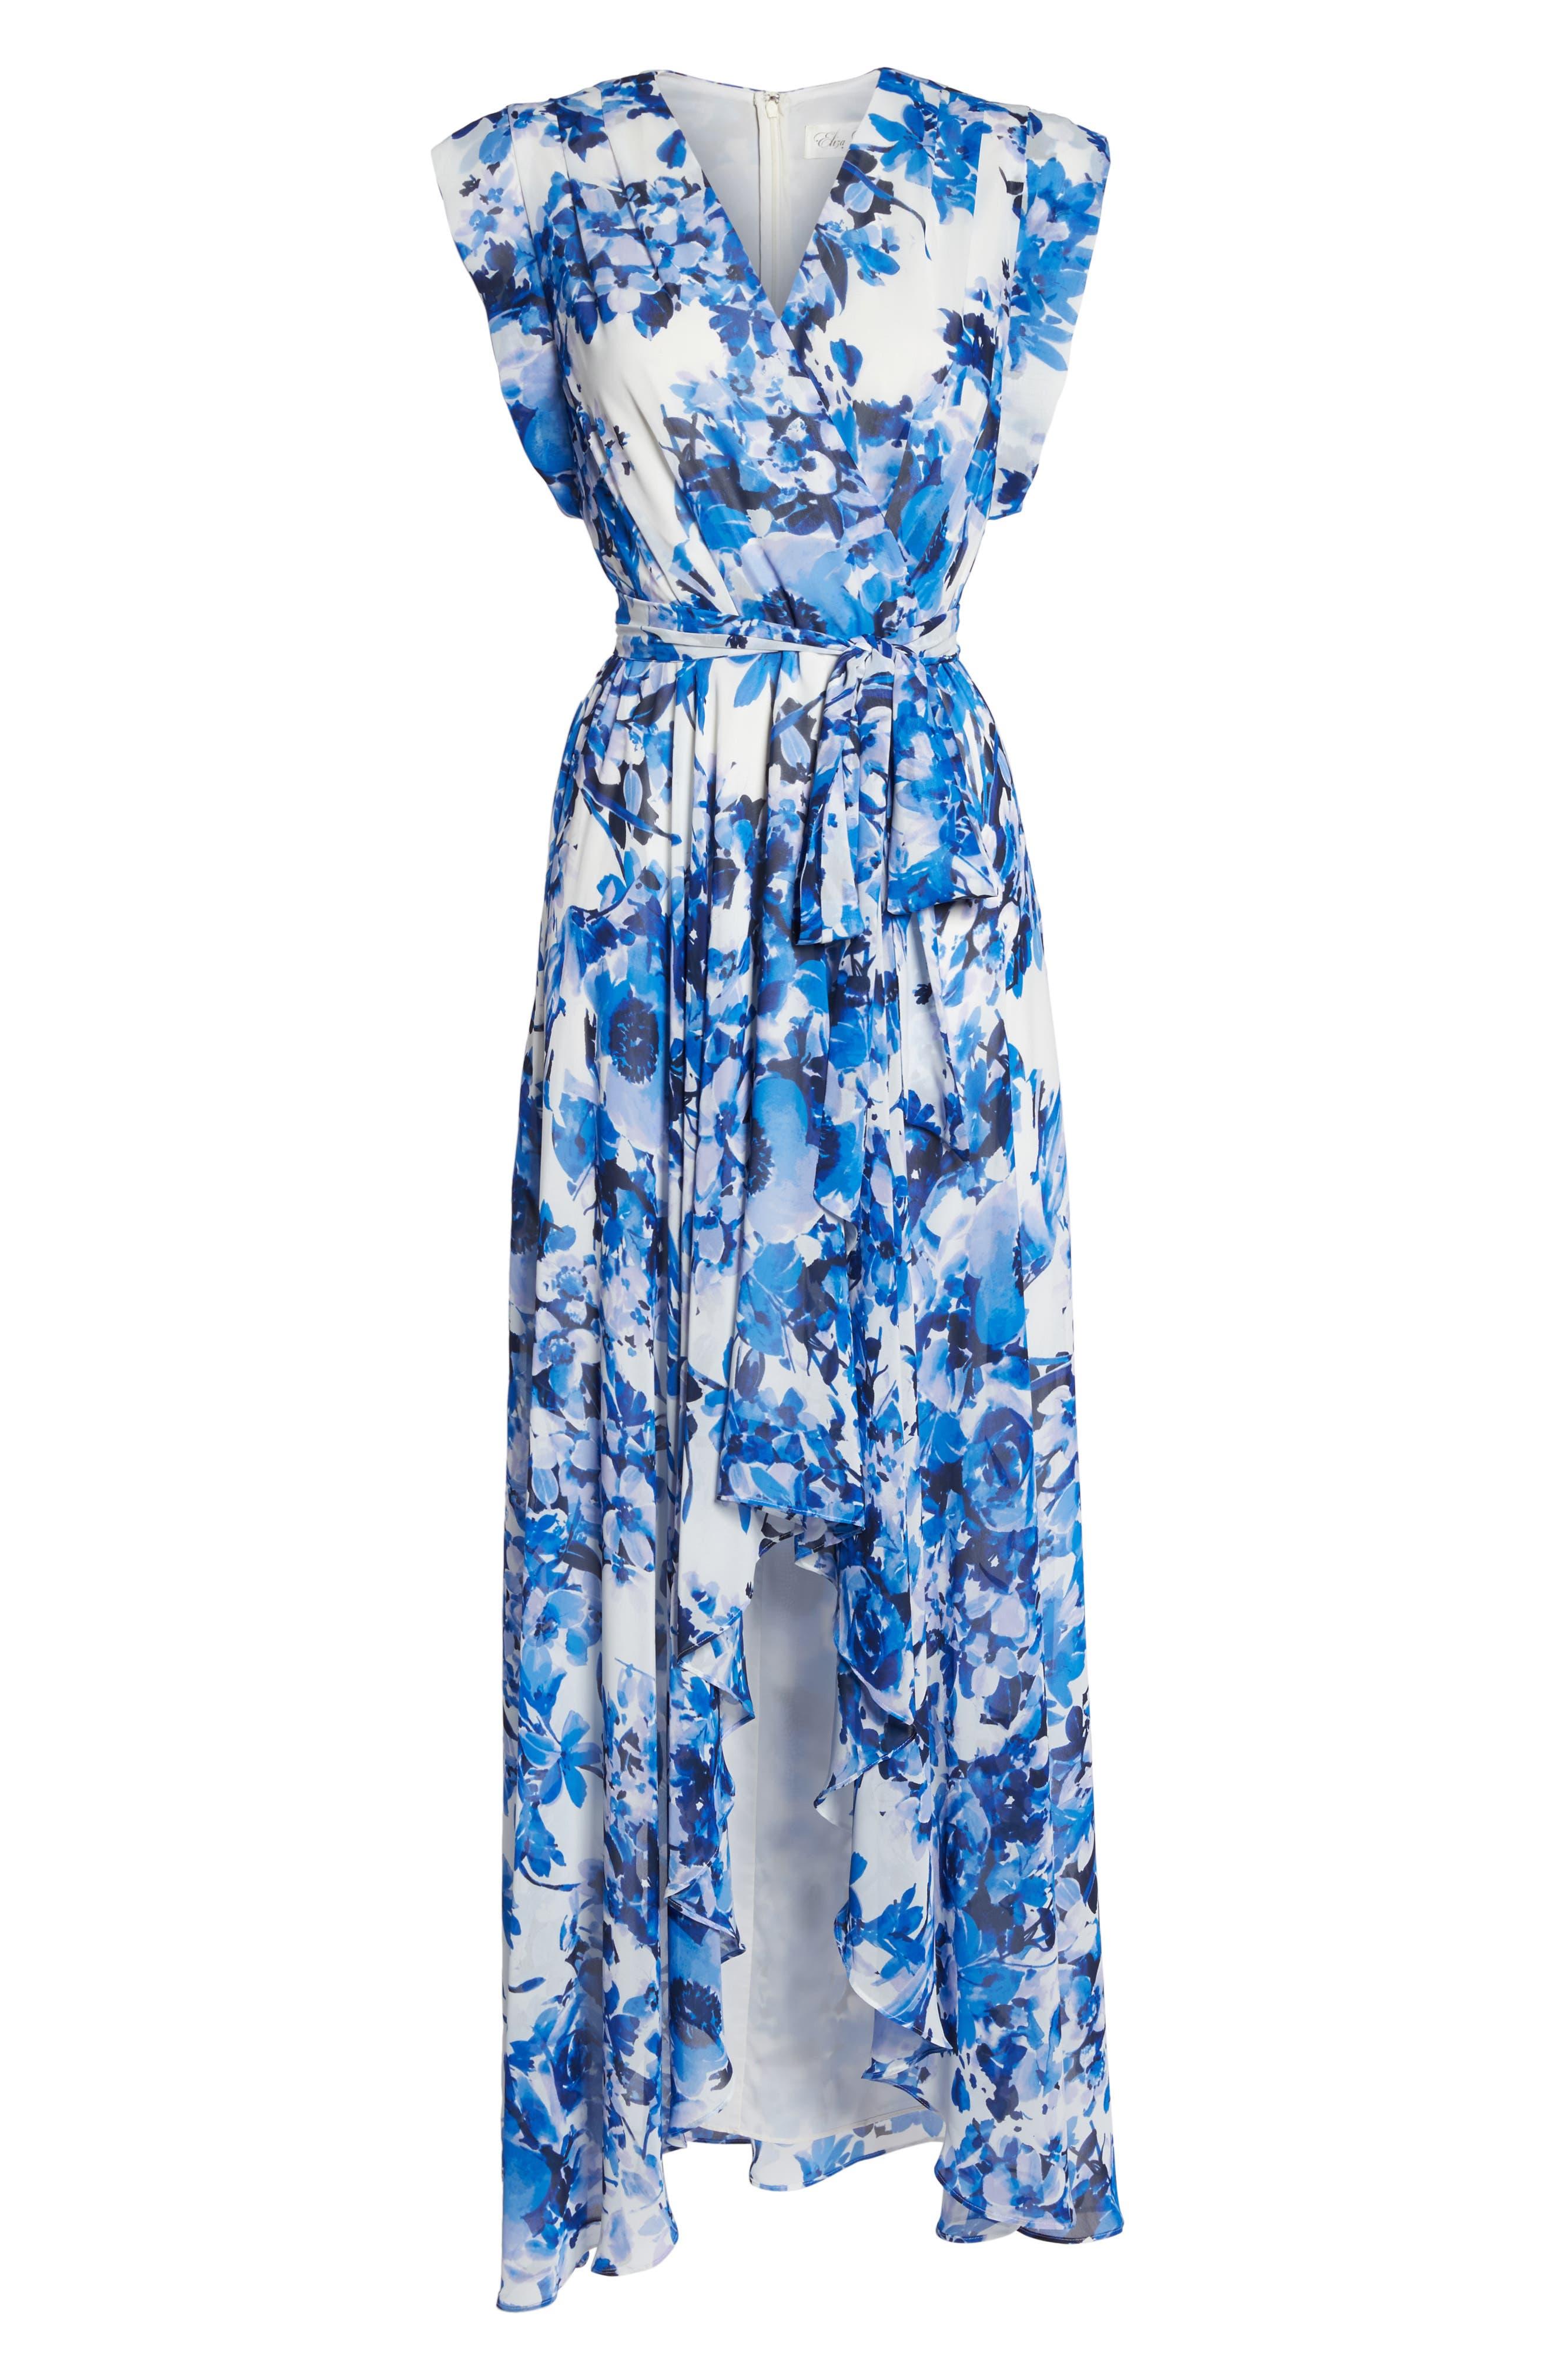 ELIZA J, Floral Ruffle High/Low Maxi Dress, Alternate thumbnail 7, color, BLUE